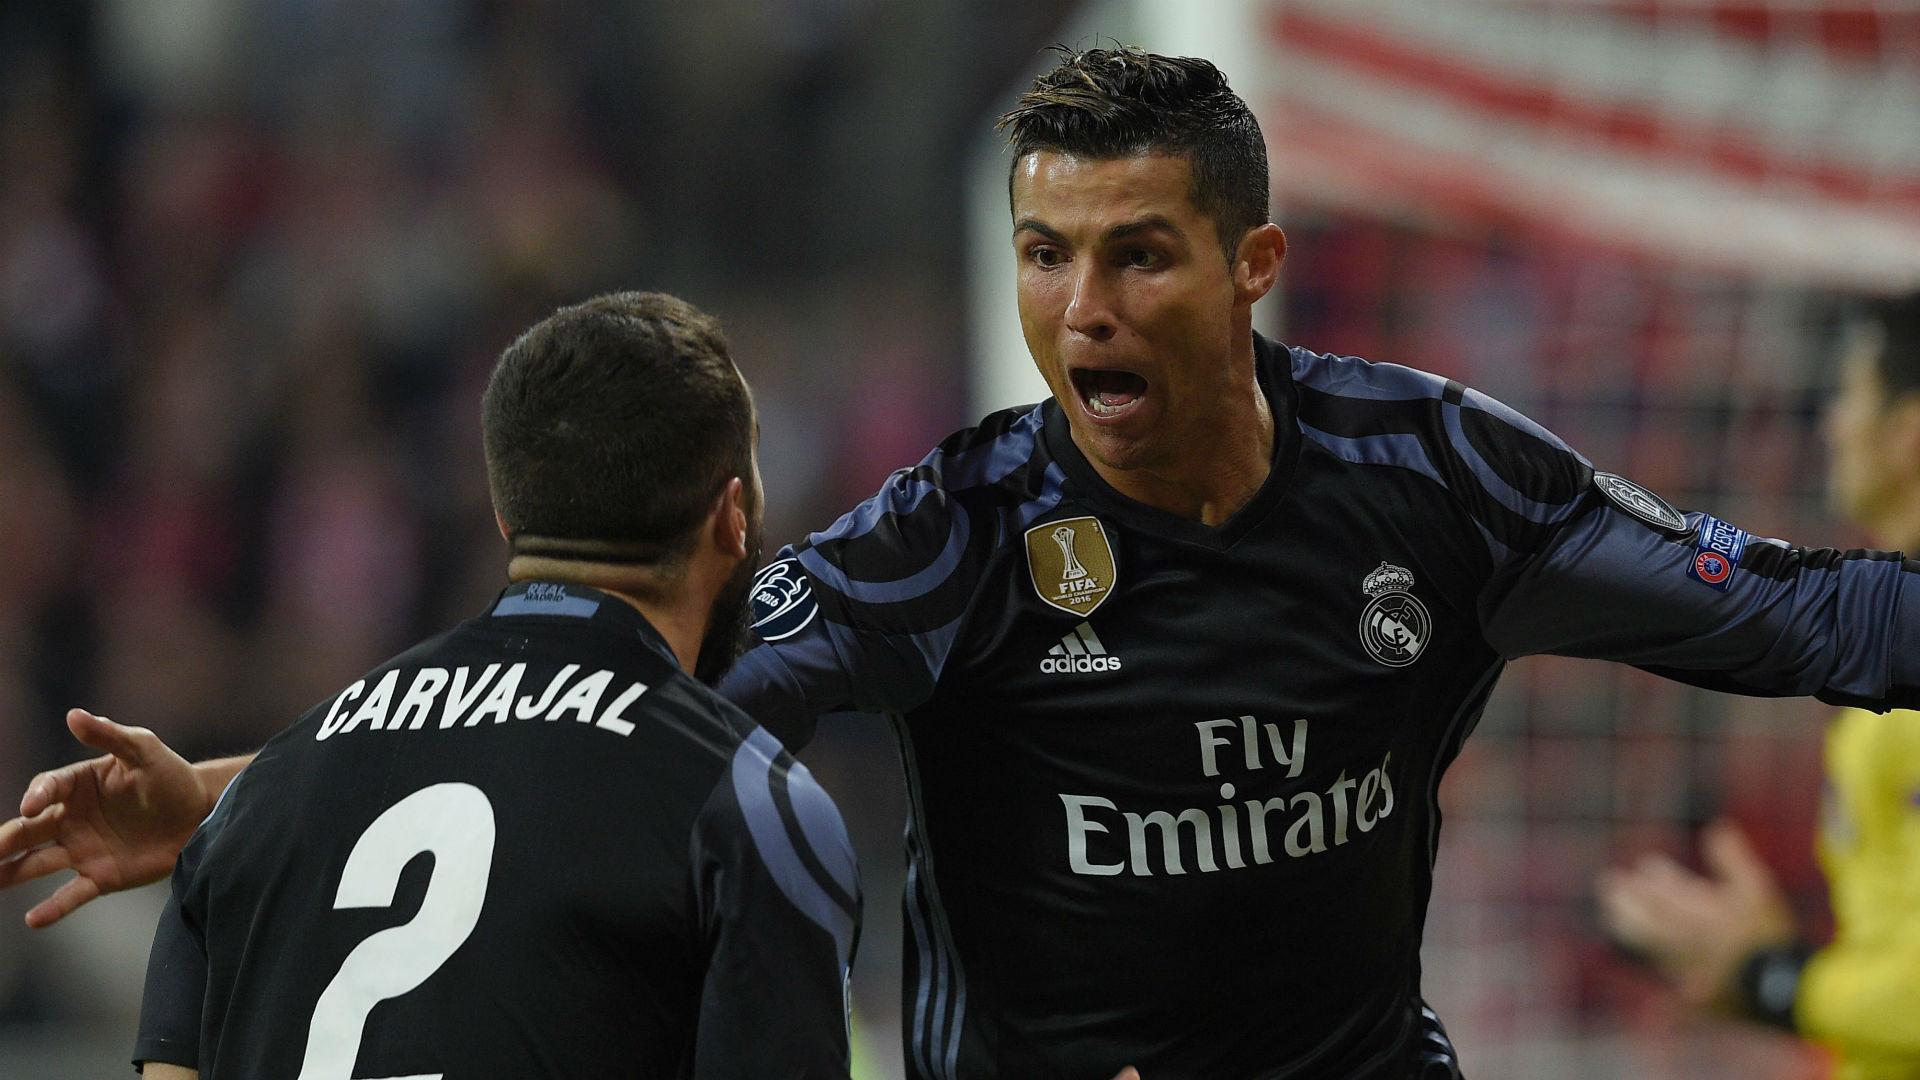 Carvajal Cristiano Ronaldo Real Madrid